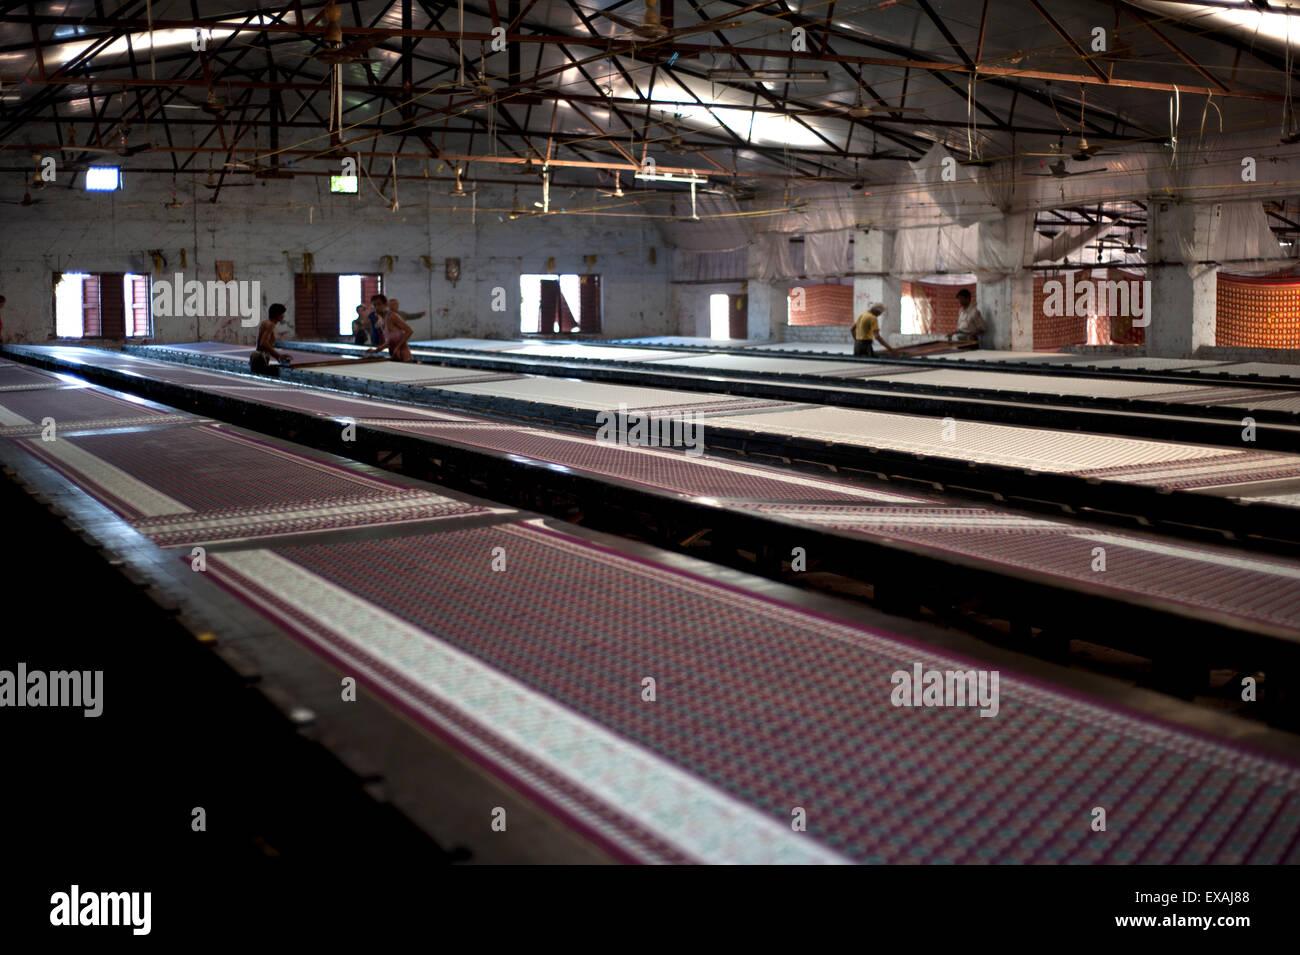 Screenprinting factory, men printing sari lengths of cotton by hand, Bhuj district, Gujarat, India, Asia - Stock Image